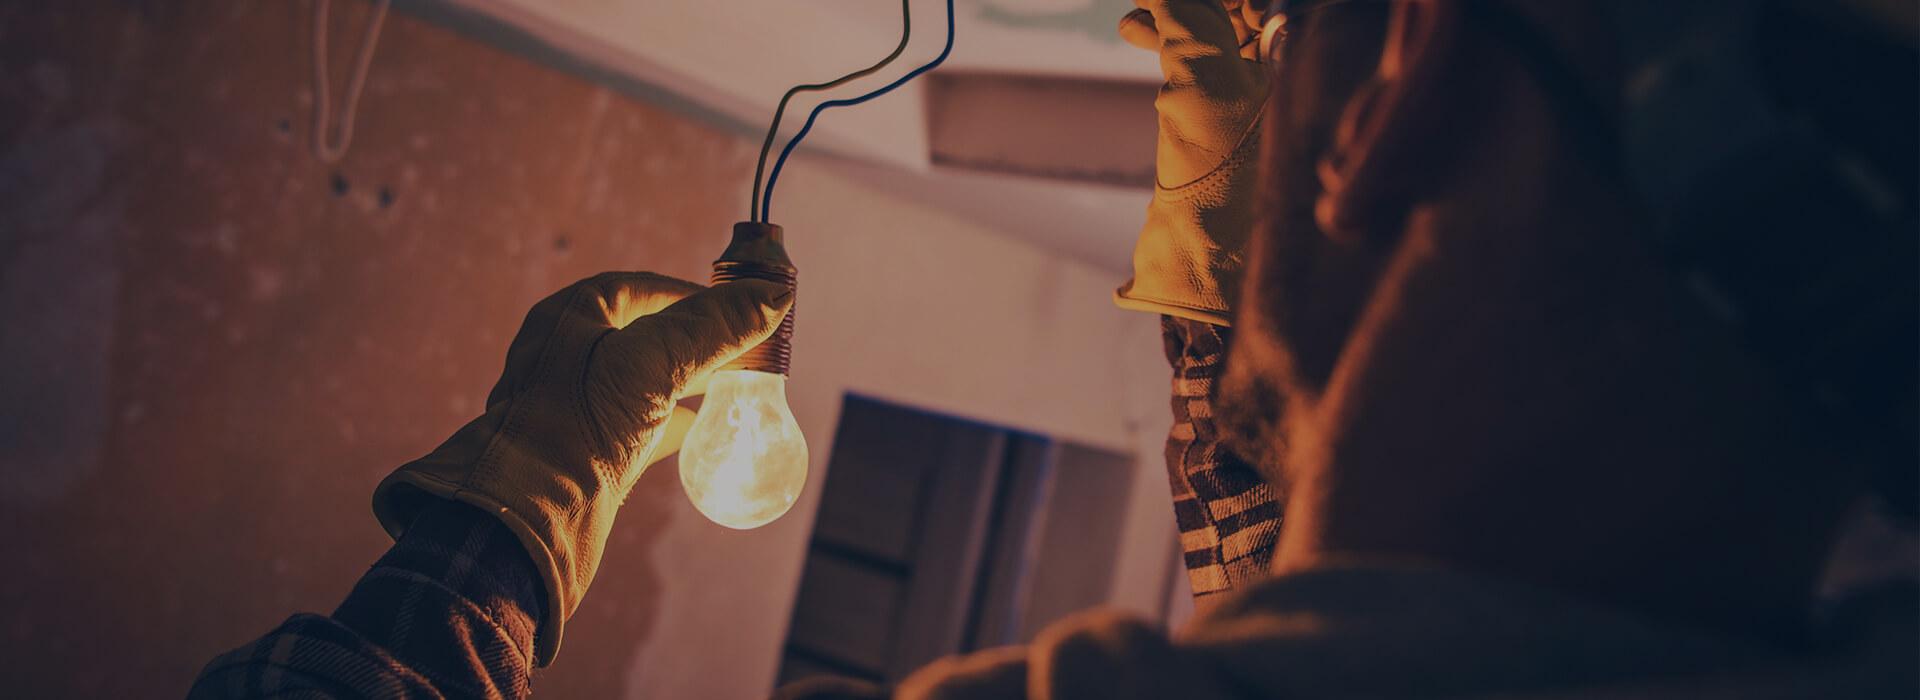 entreprise-electricite-Stations-ciney